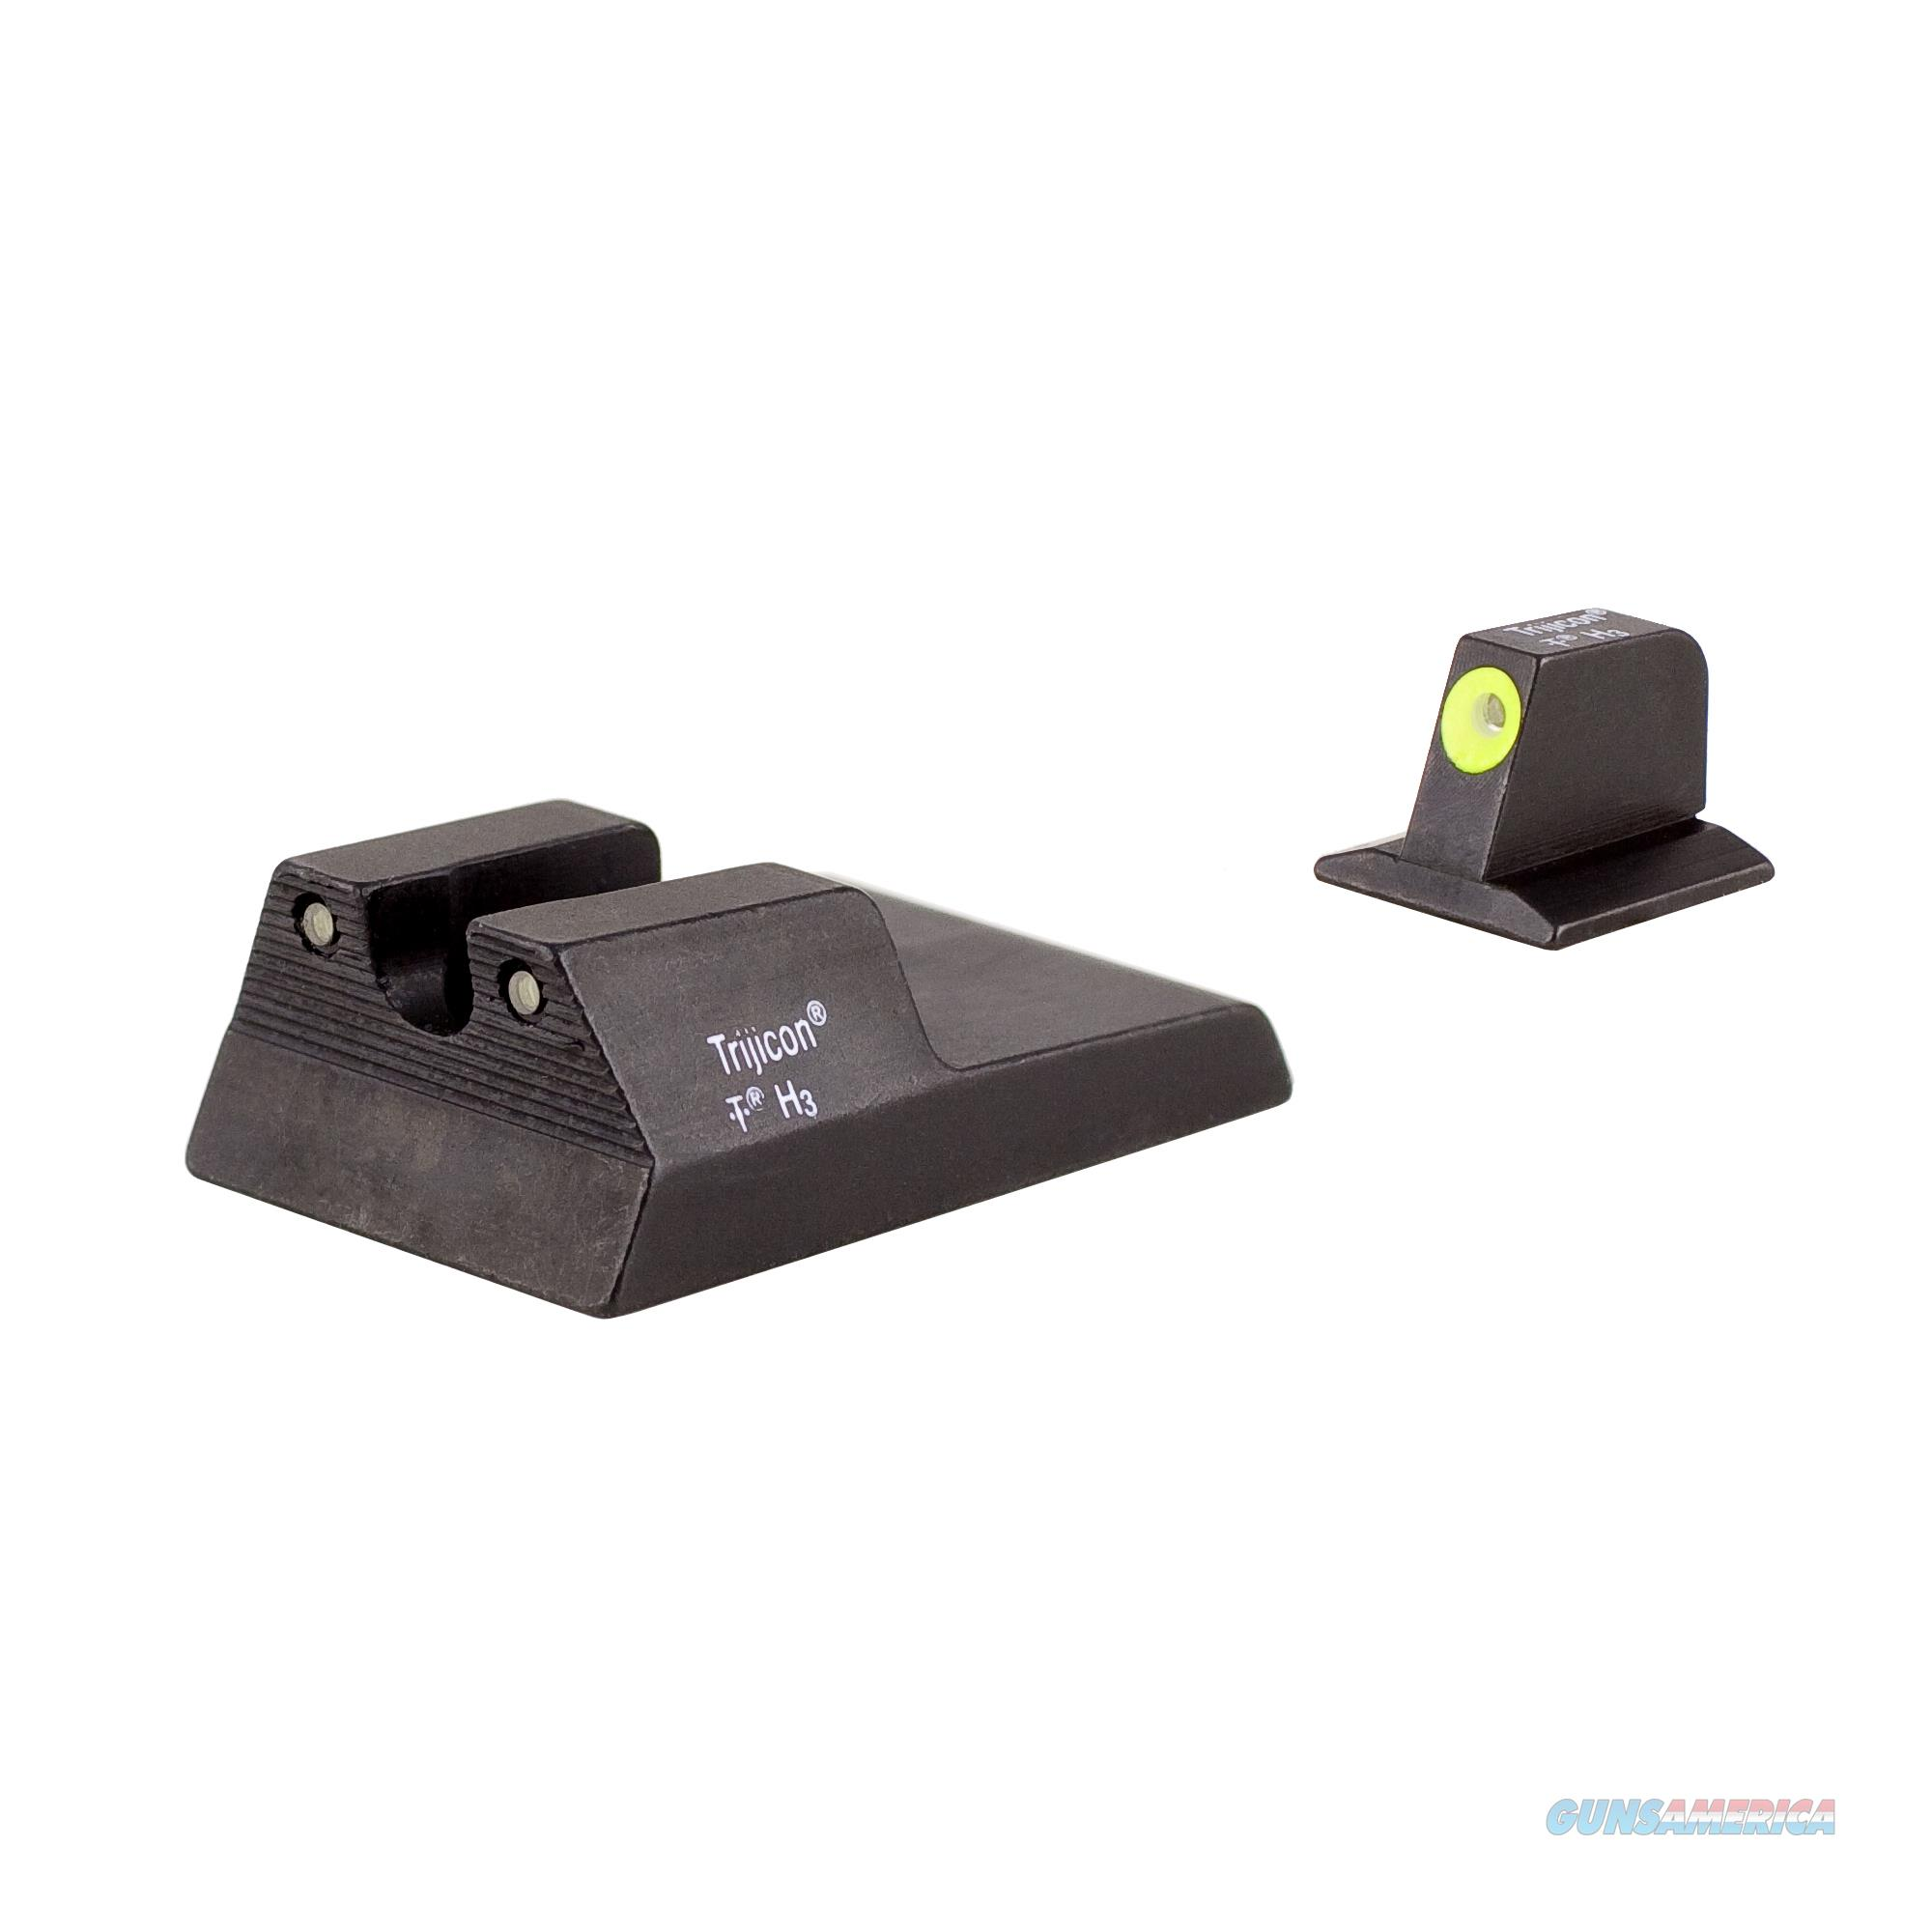 Trijicon Ruger Hd Night Sight Set RA115Y  Non-Guns > Iron/Metal/Peep Sights